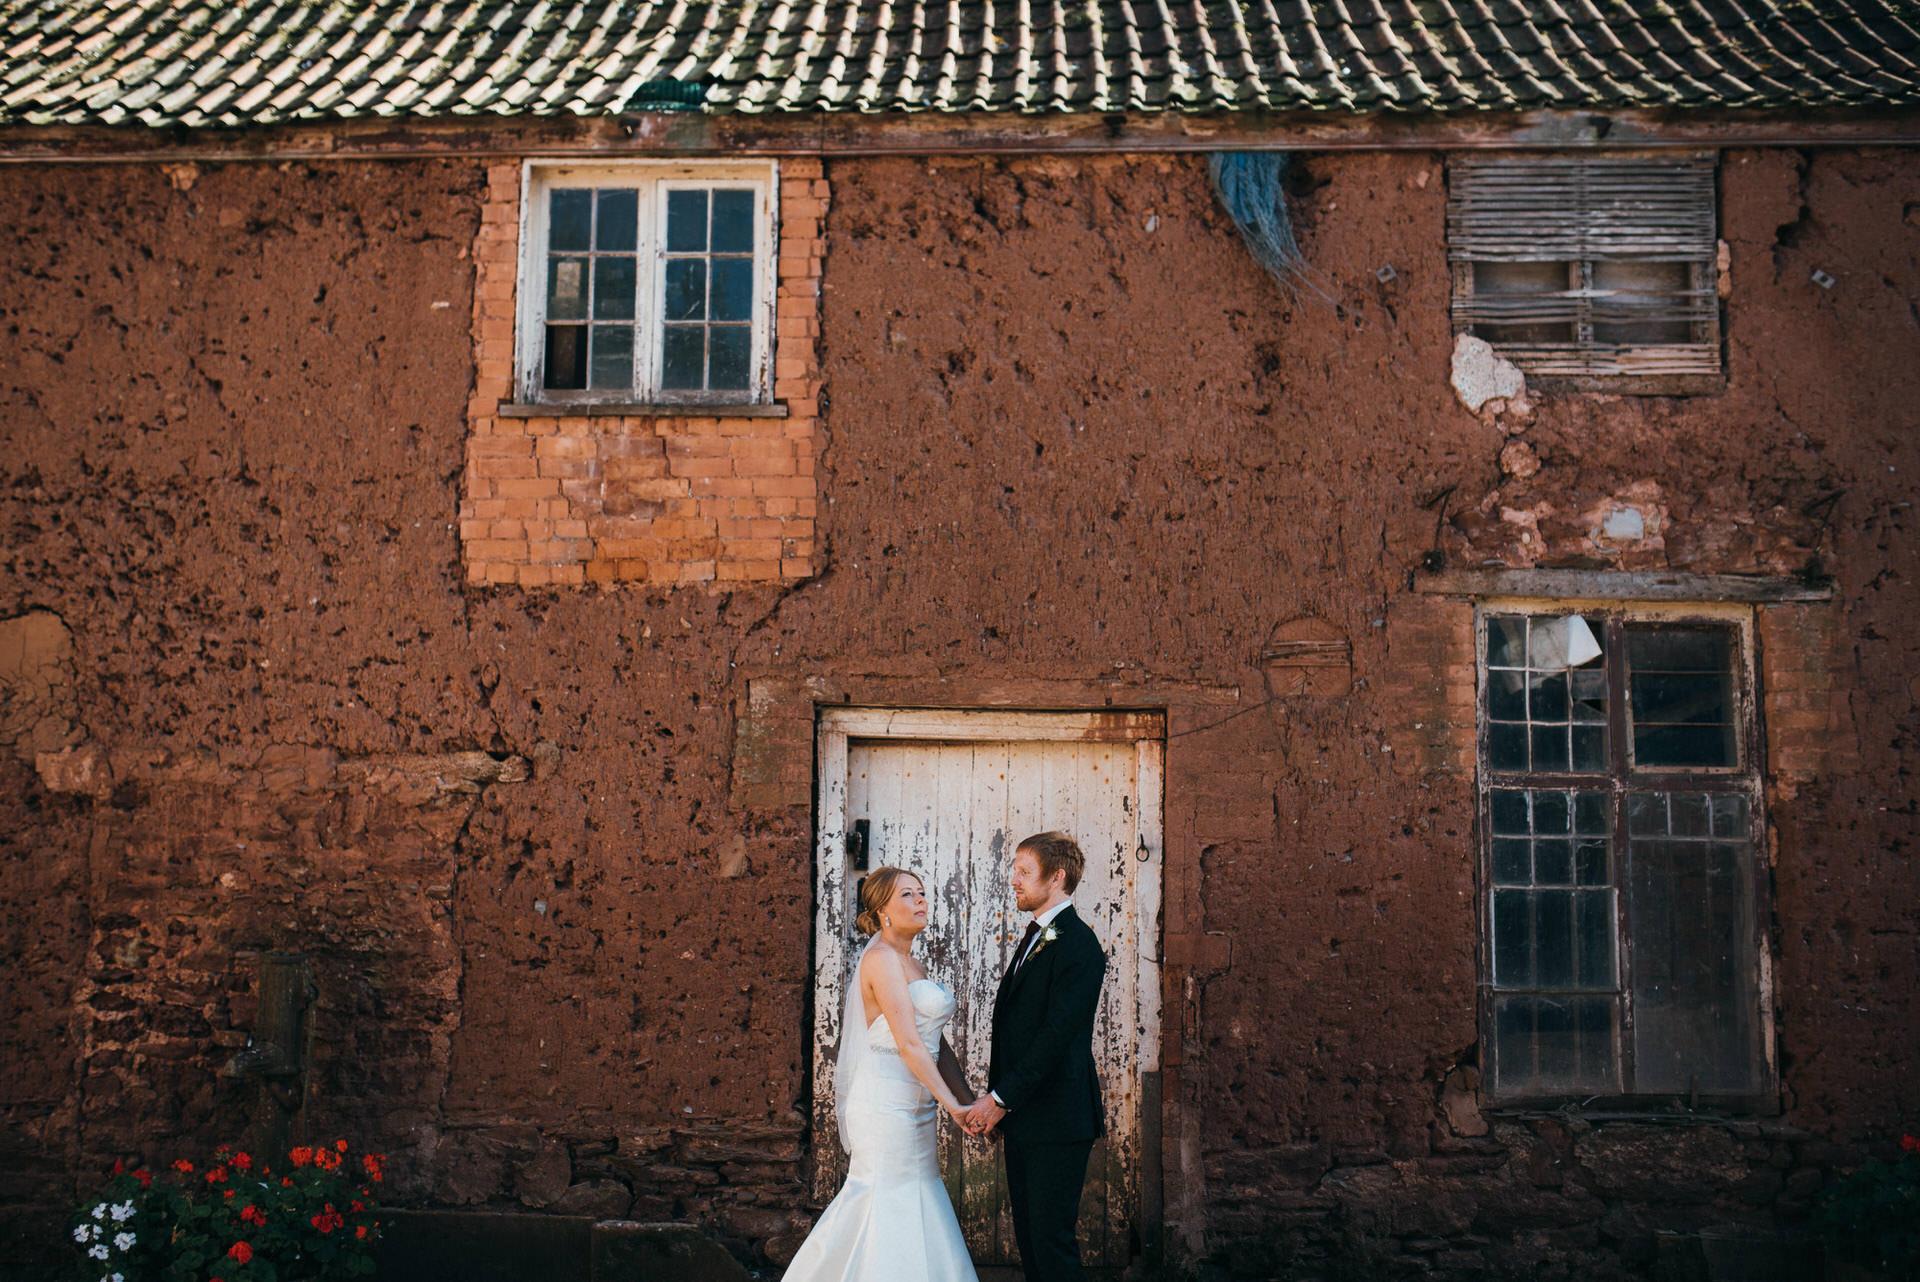 Maunsel house wedding photography 34 wedding portrait